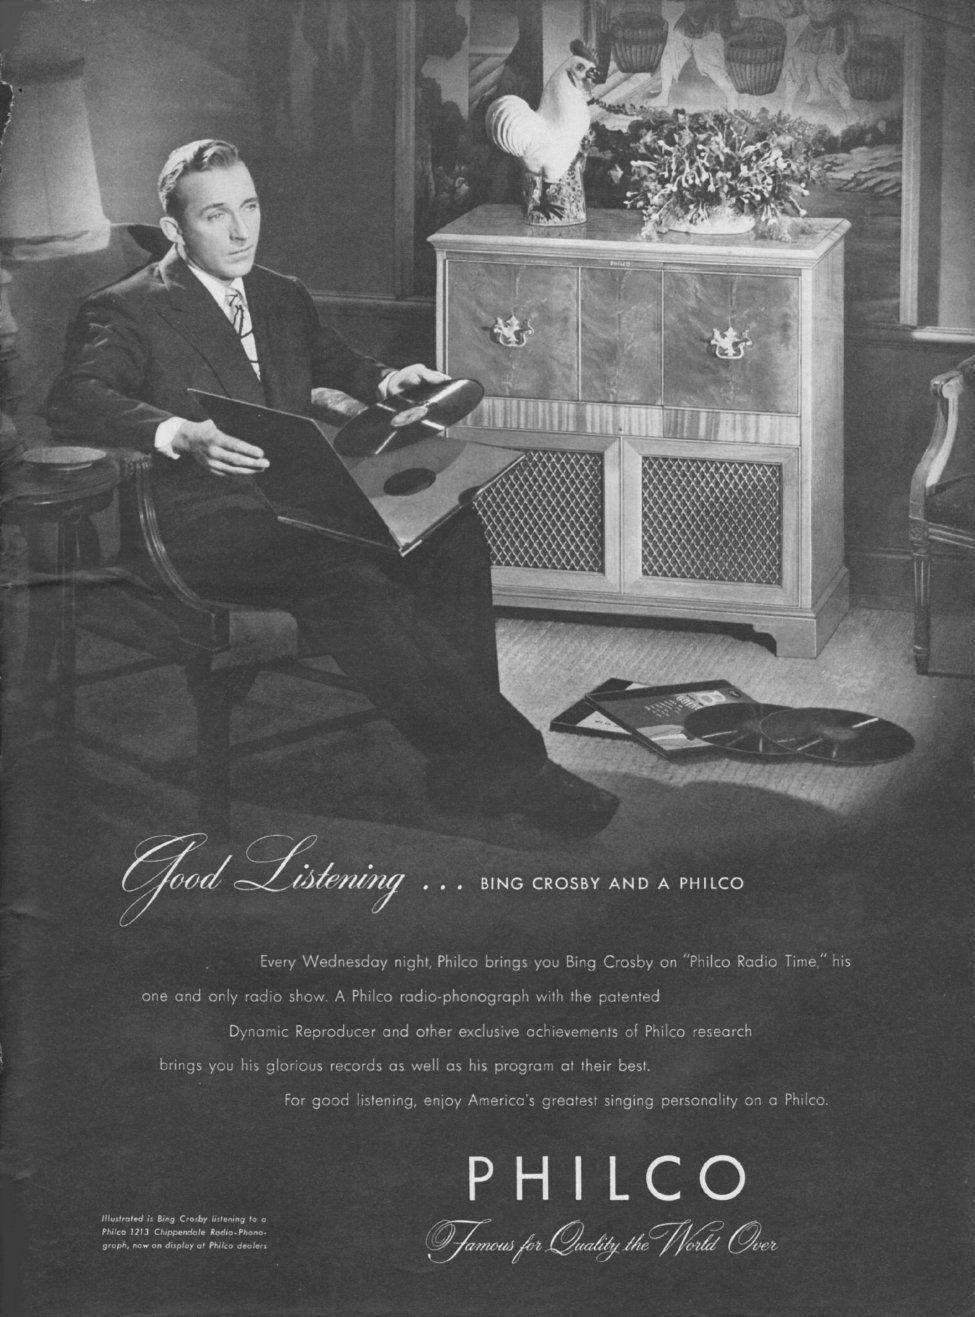 Pin by J.E. Hart on Vintage Celebrity Ads in 2019 Bing